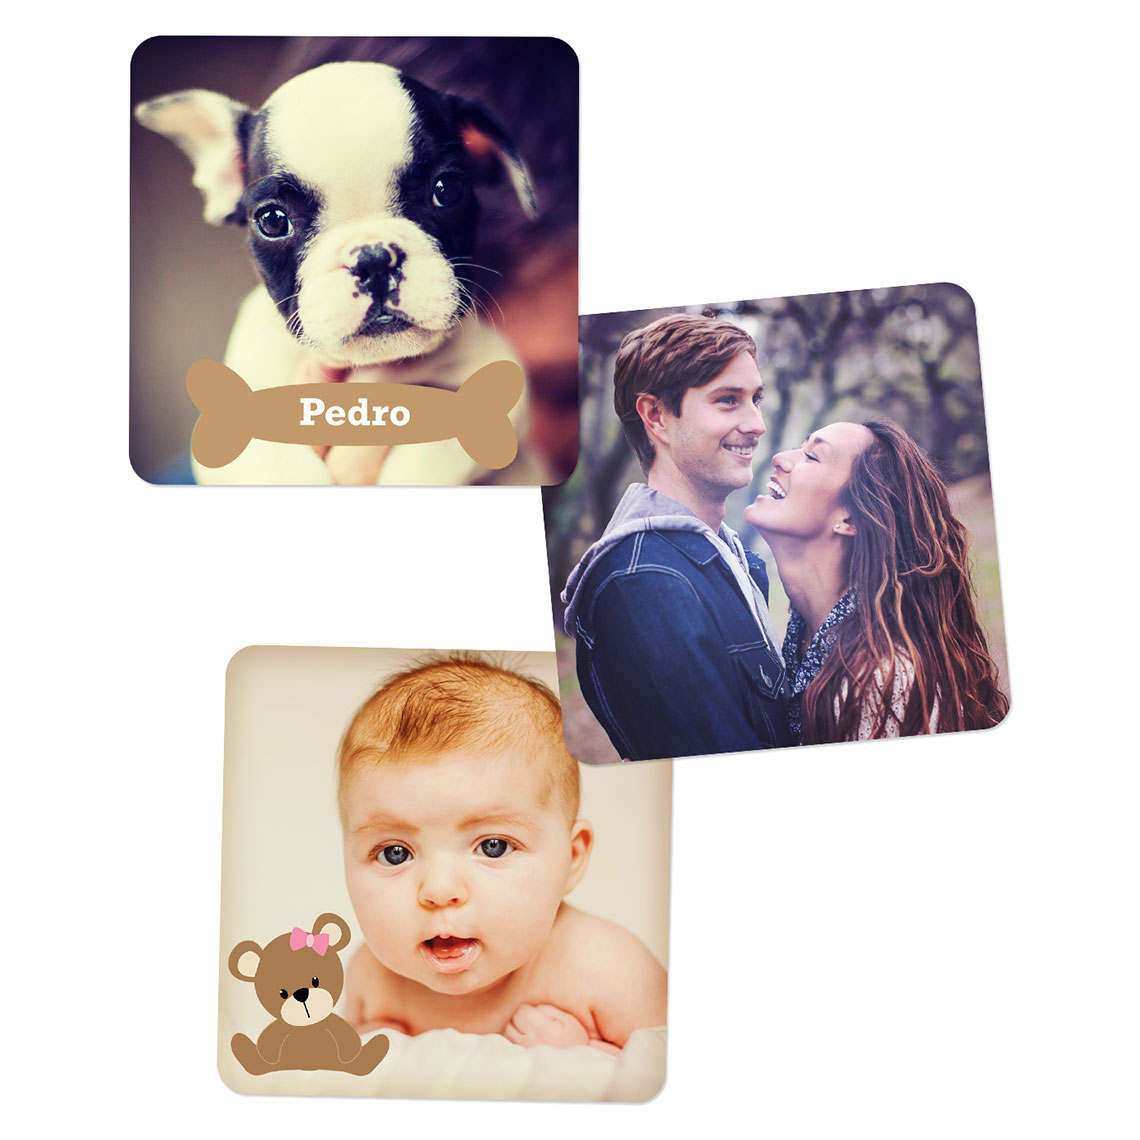 Custom Stickers Sheet Of 20 Custom Stickers Stationery Card